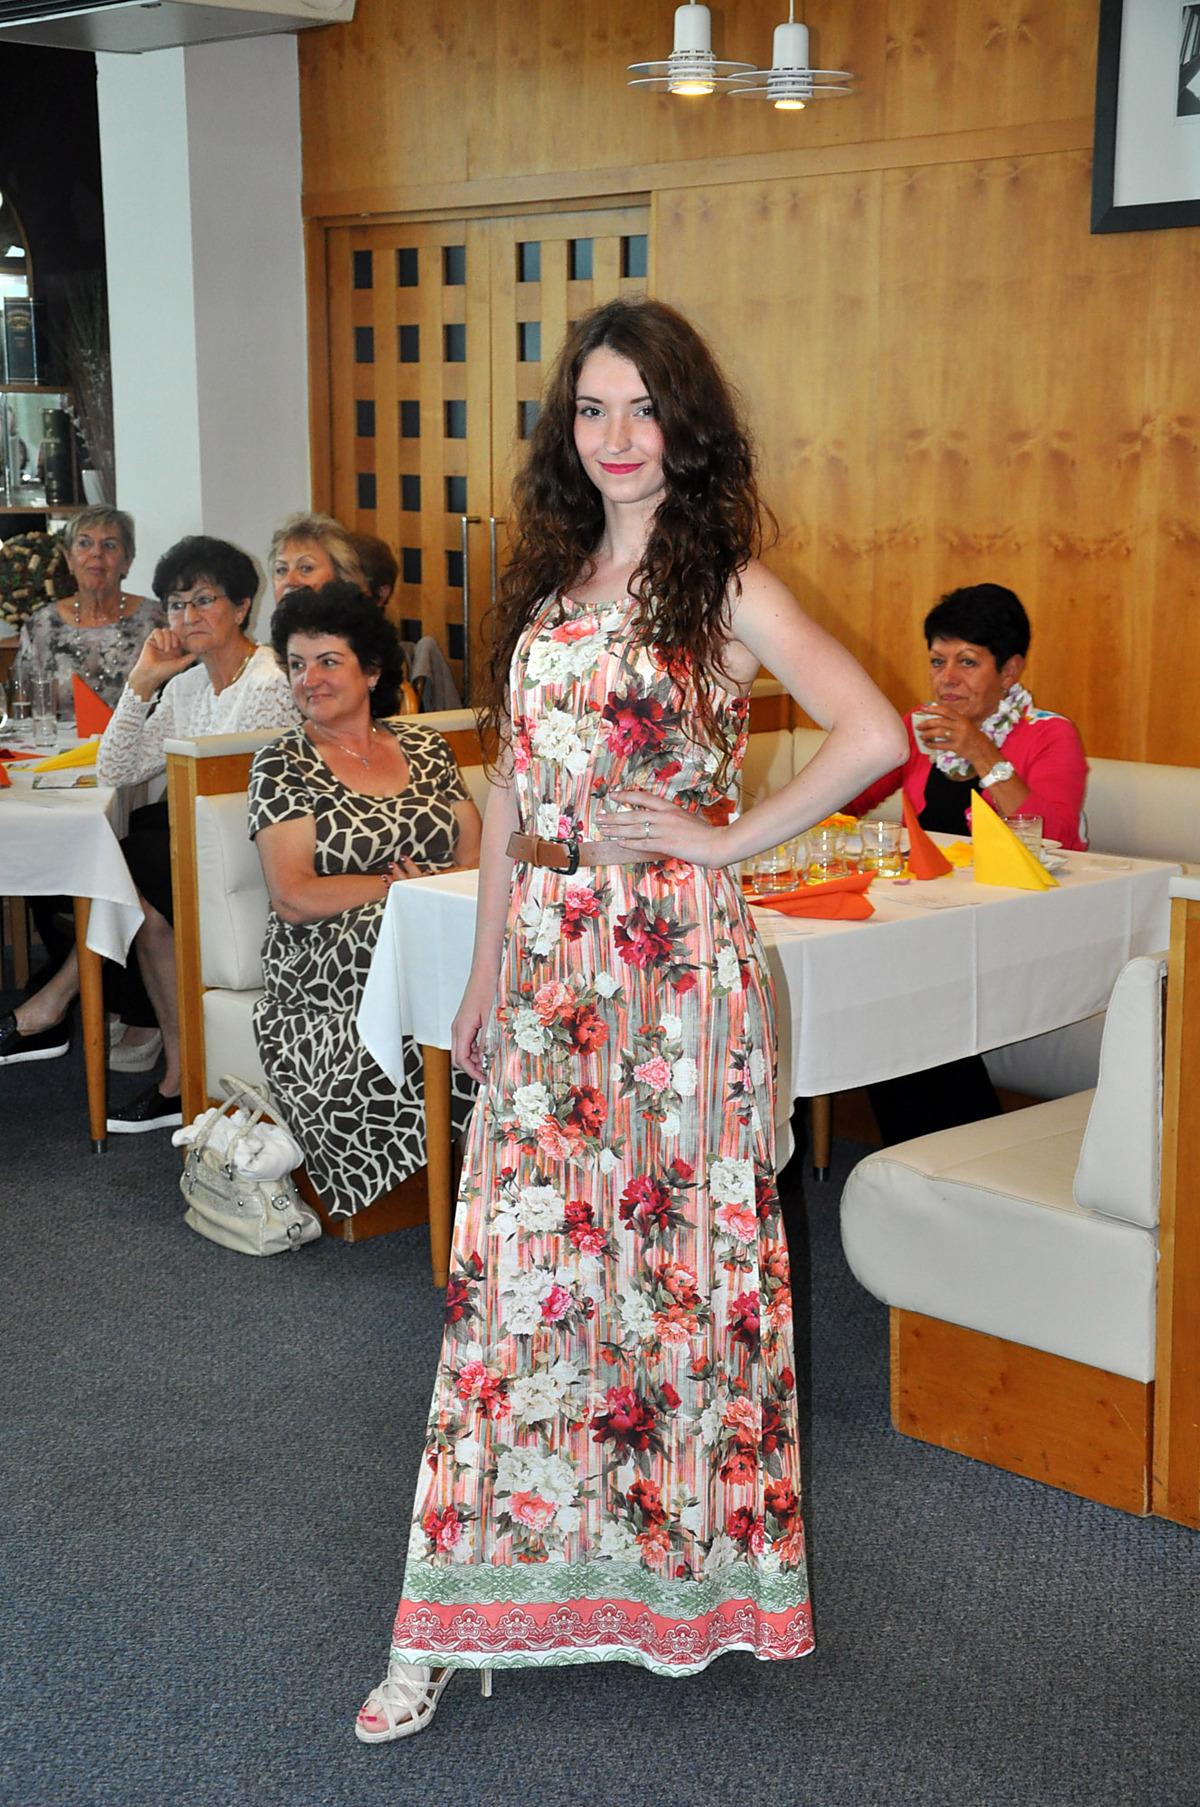 9b292a874227 Restaurace Harmonie prožila žhavé květinové léto